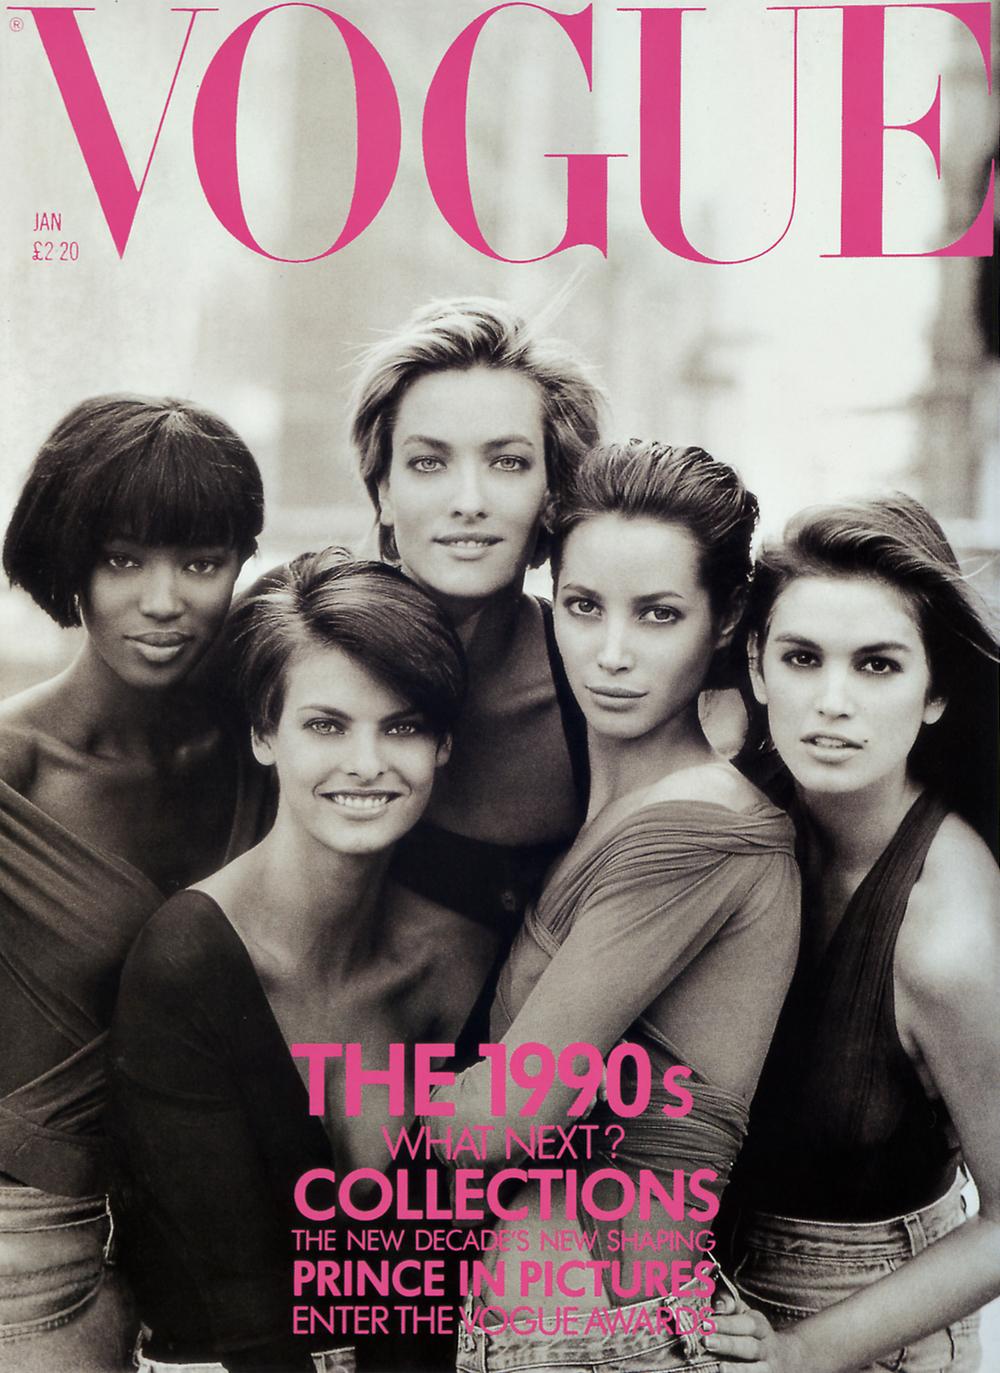 British Vogue Cover January 1990